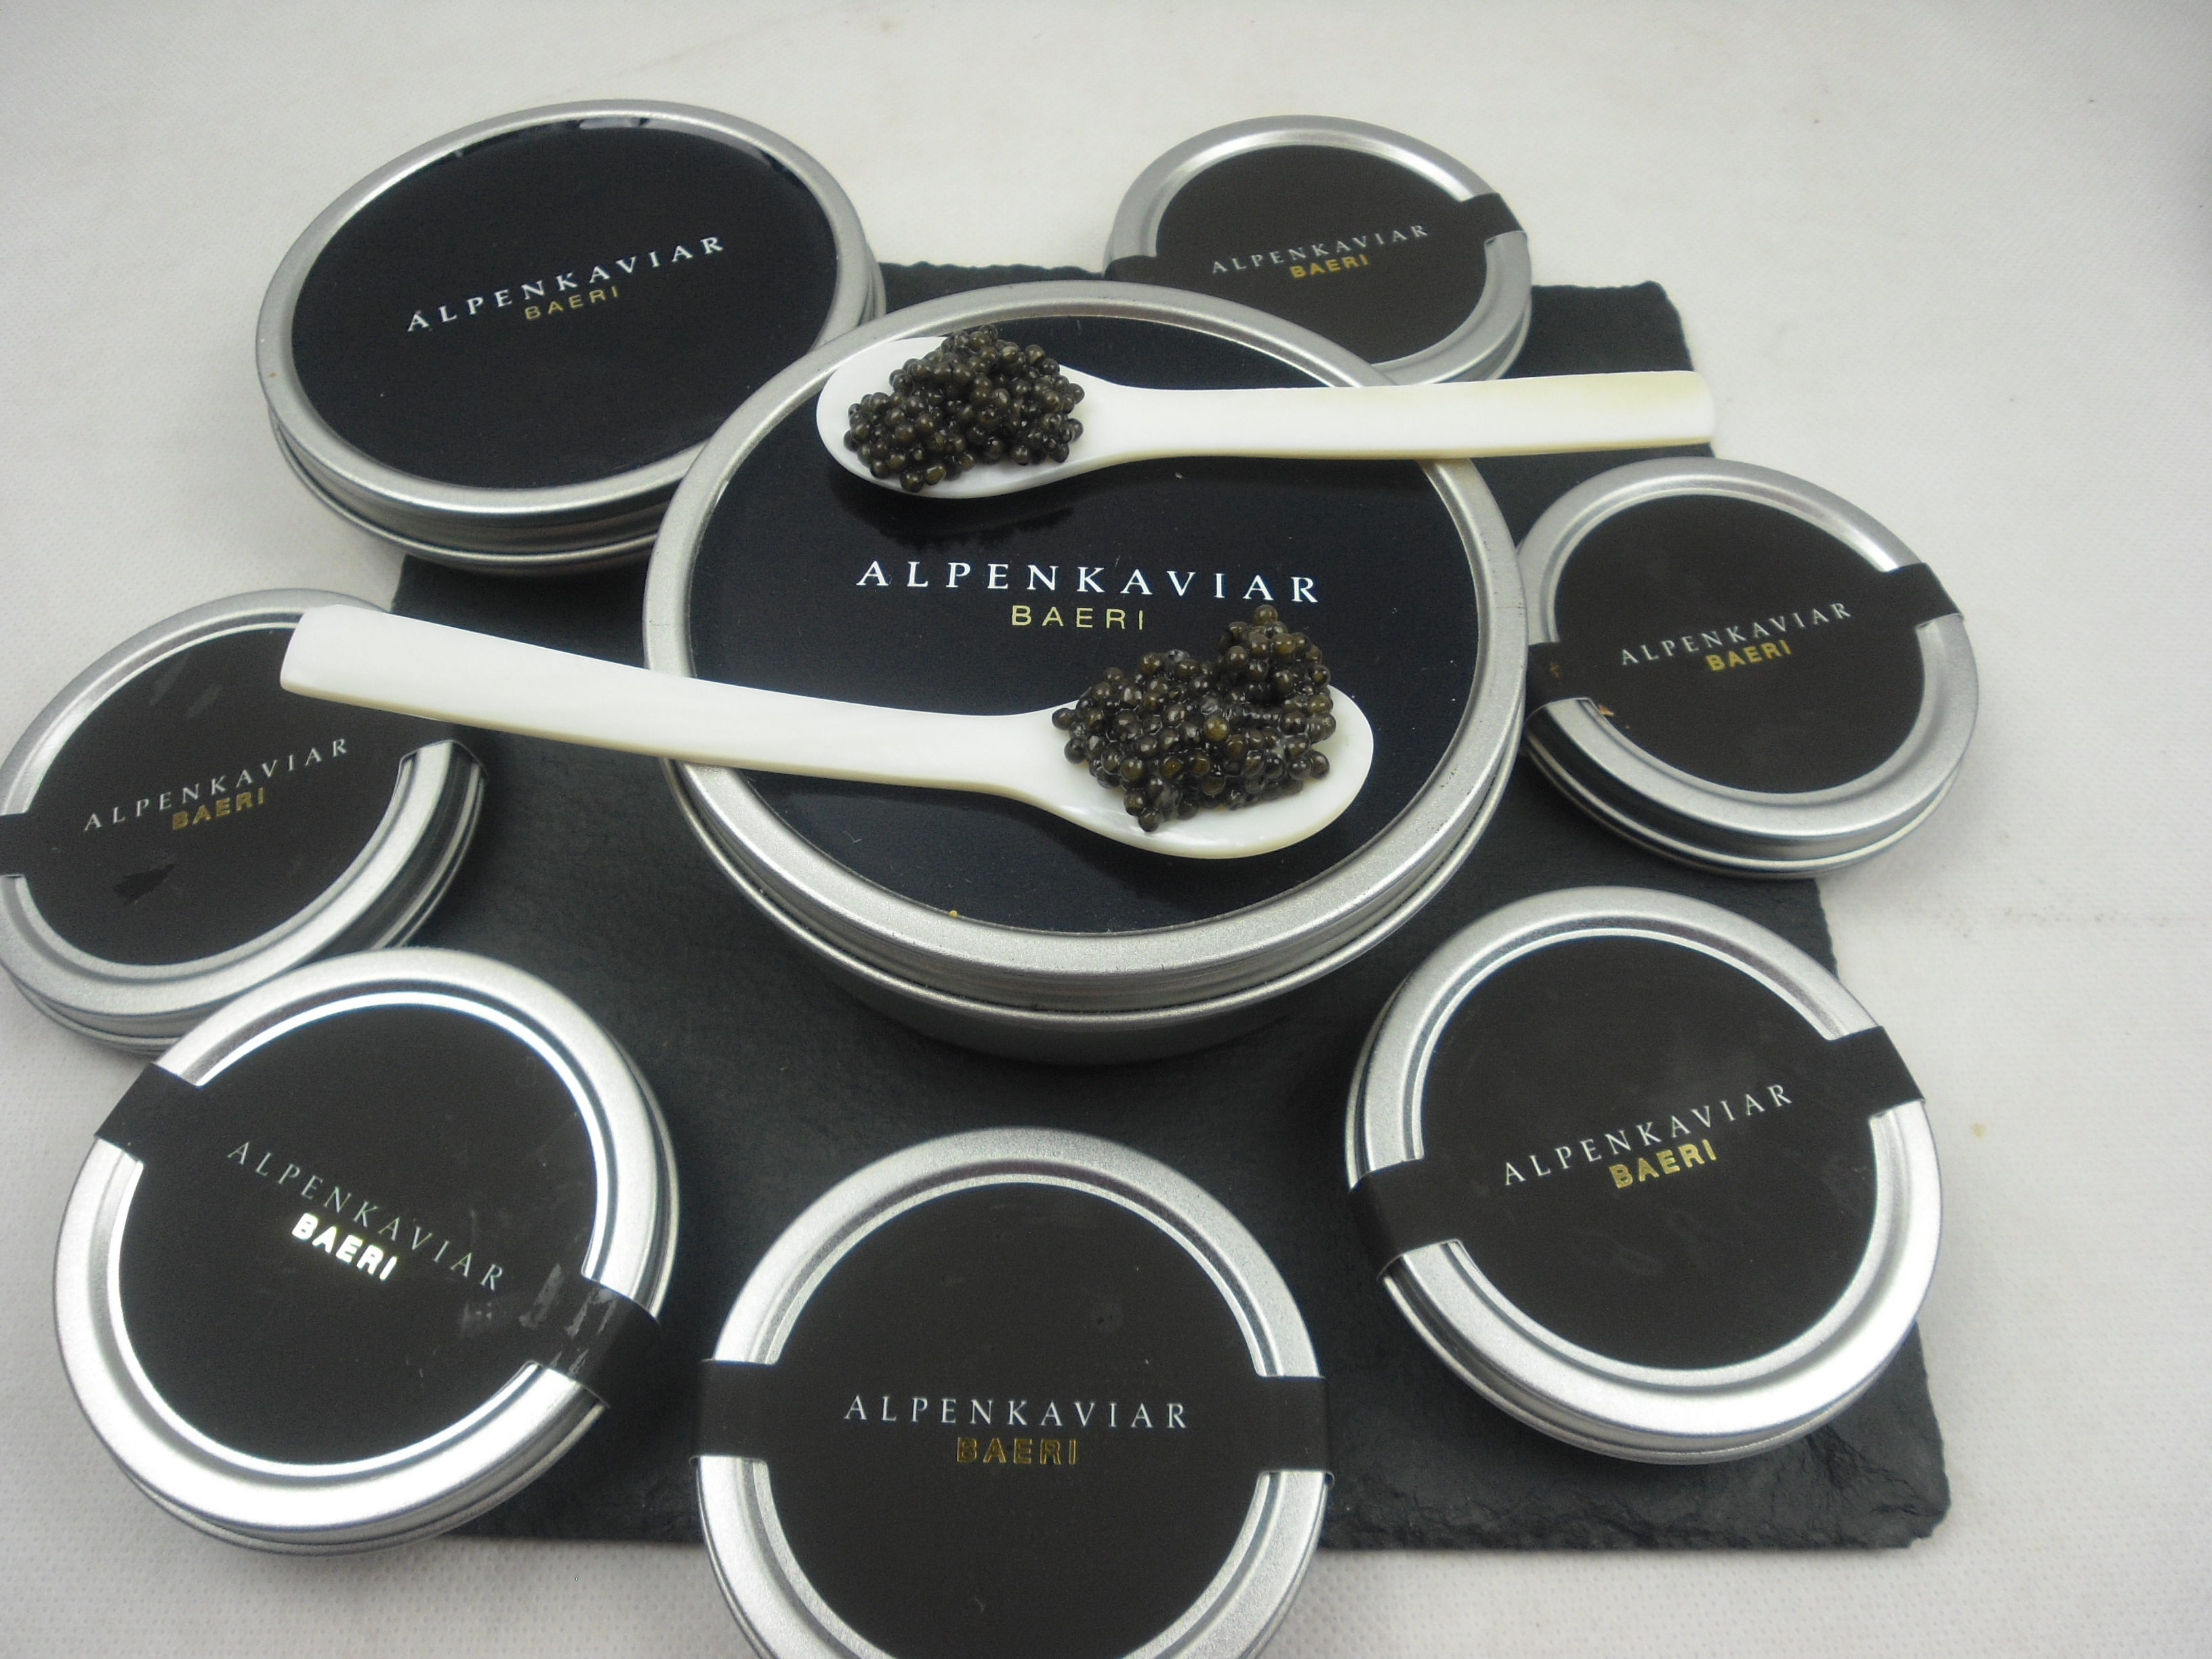 Alpenkaviar